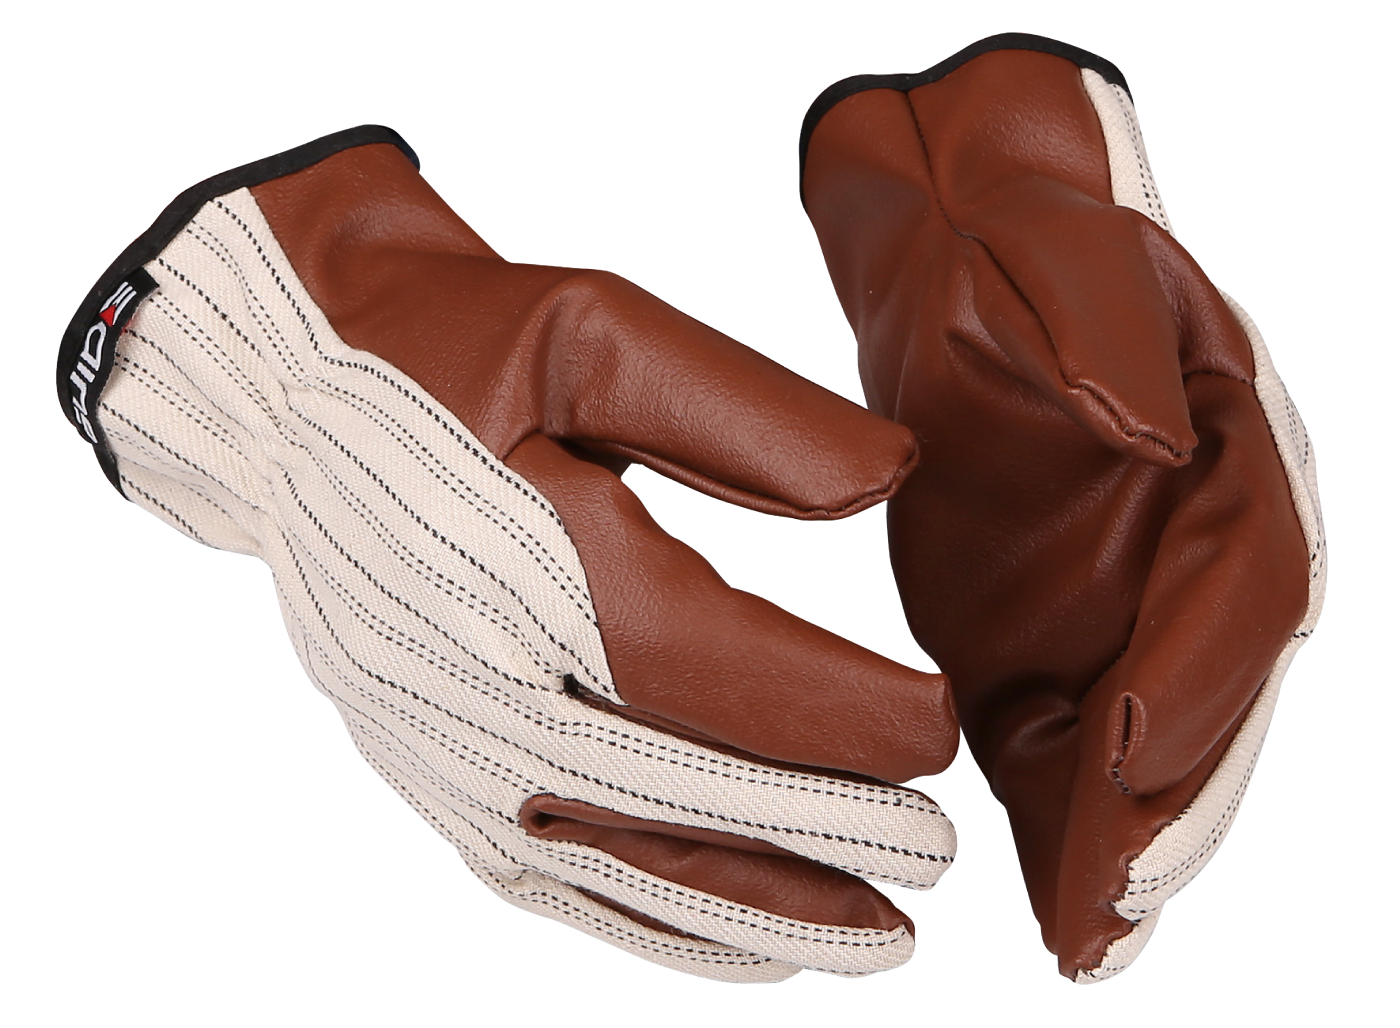 Heavyweight Working Glove GUIDE 820